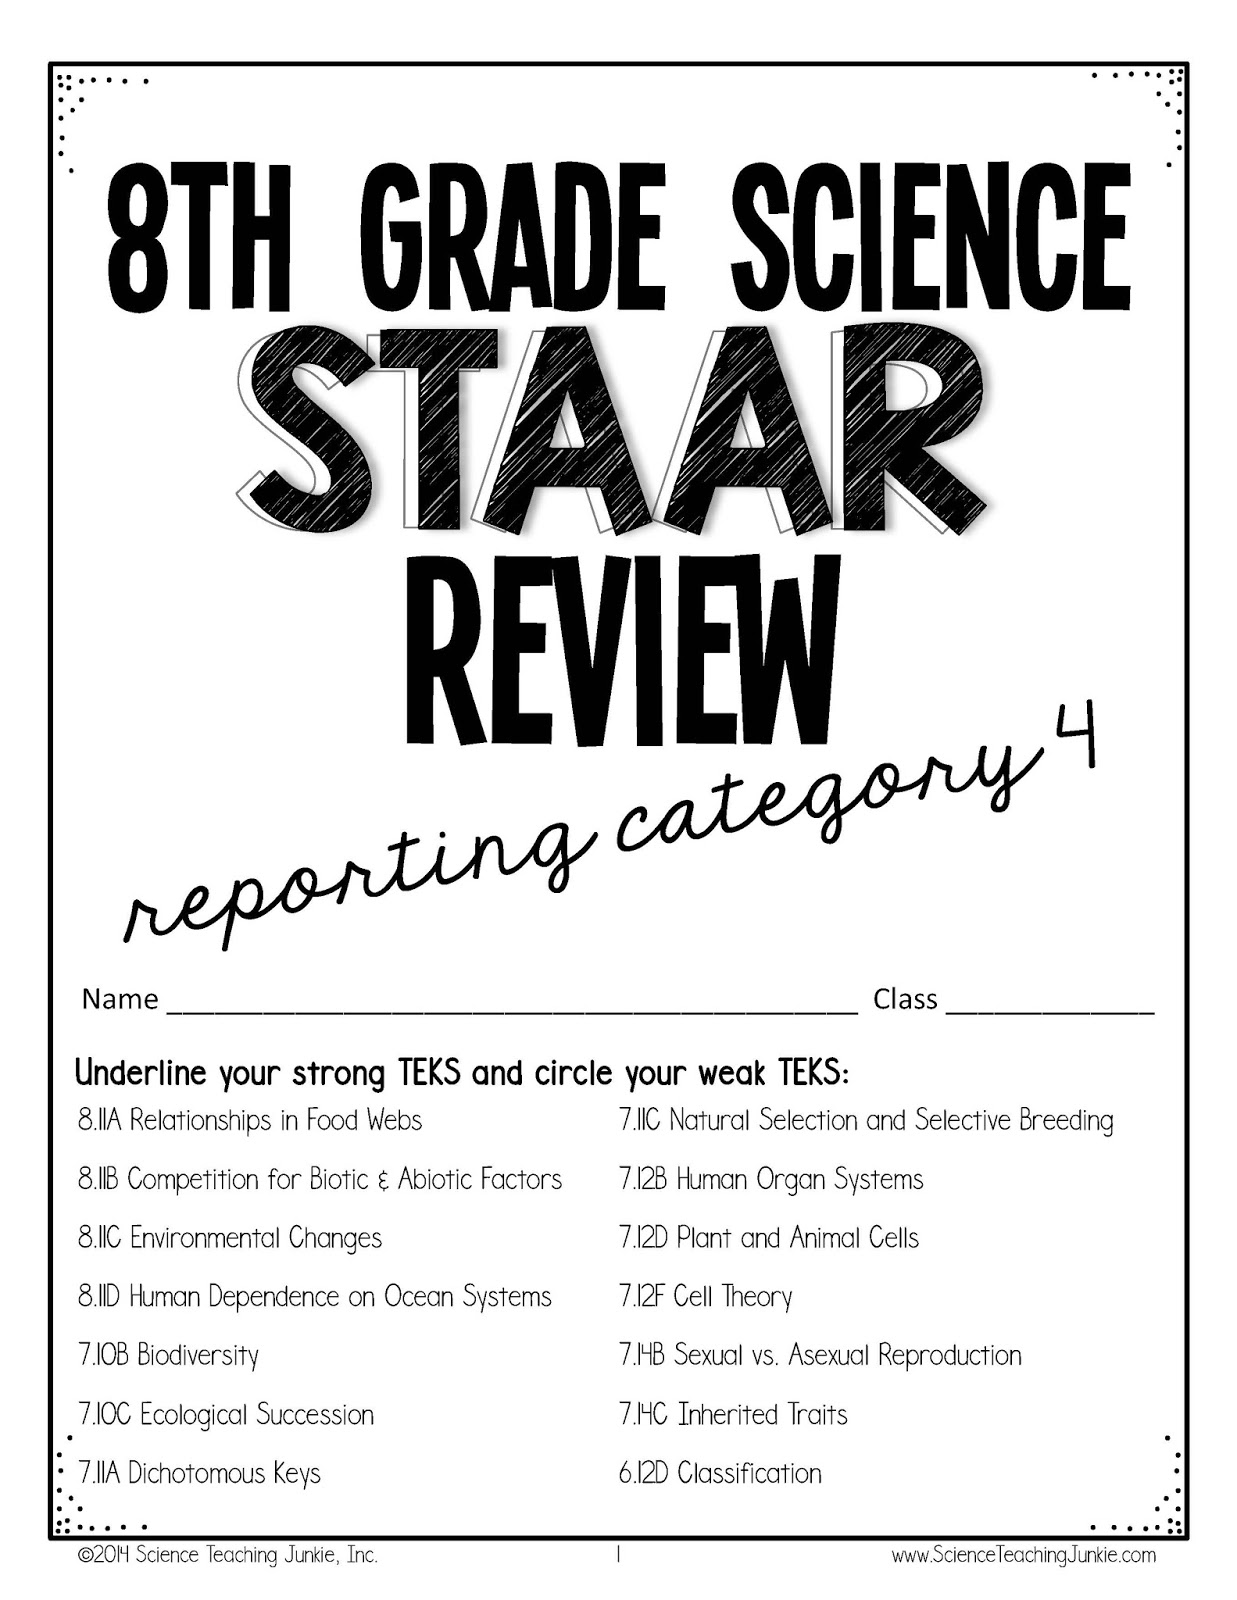 Science Teaching Junkie Inc 8th Grade Science Staar Review